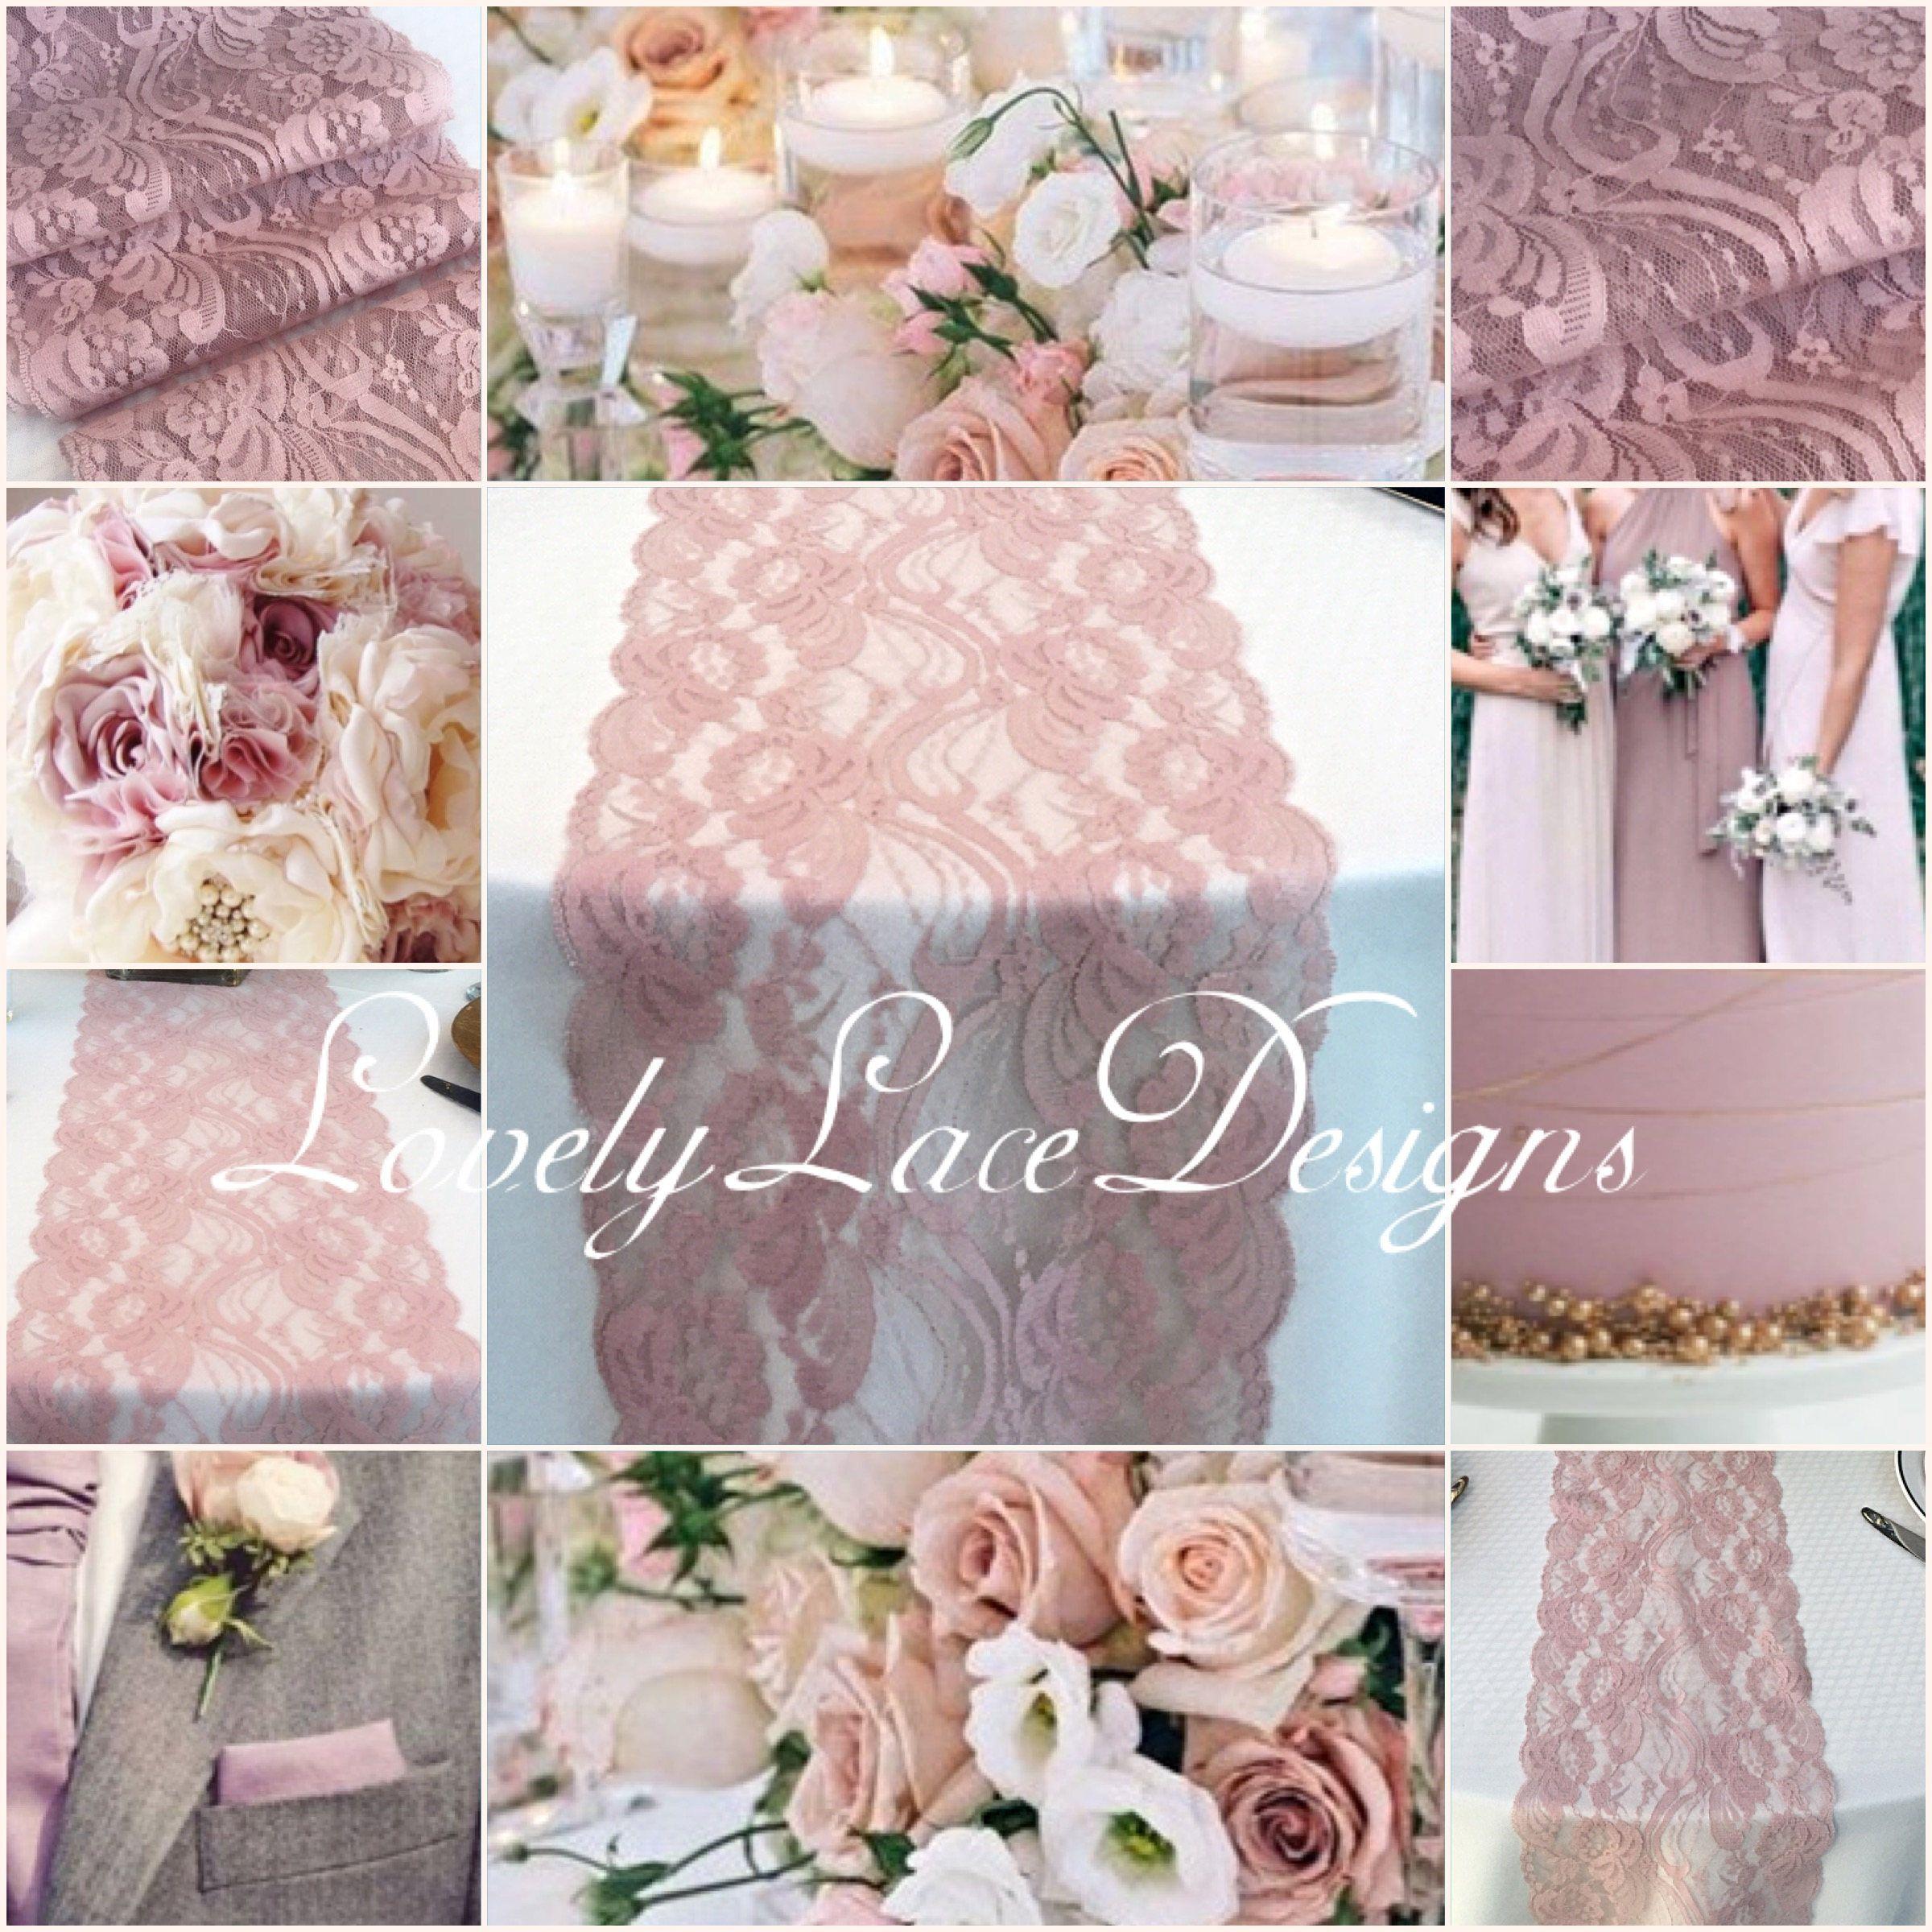 Pin By Steffi Keller On Wedding Ideas Rose Centerpieces Wedding Dusty Rose Wedding Dusty Rose Wedding Theme